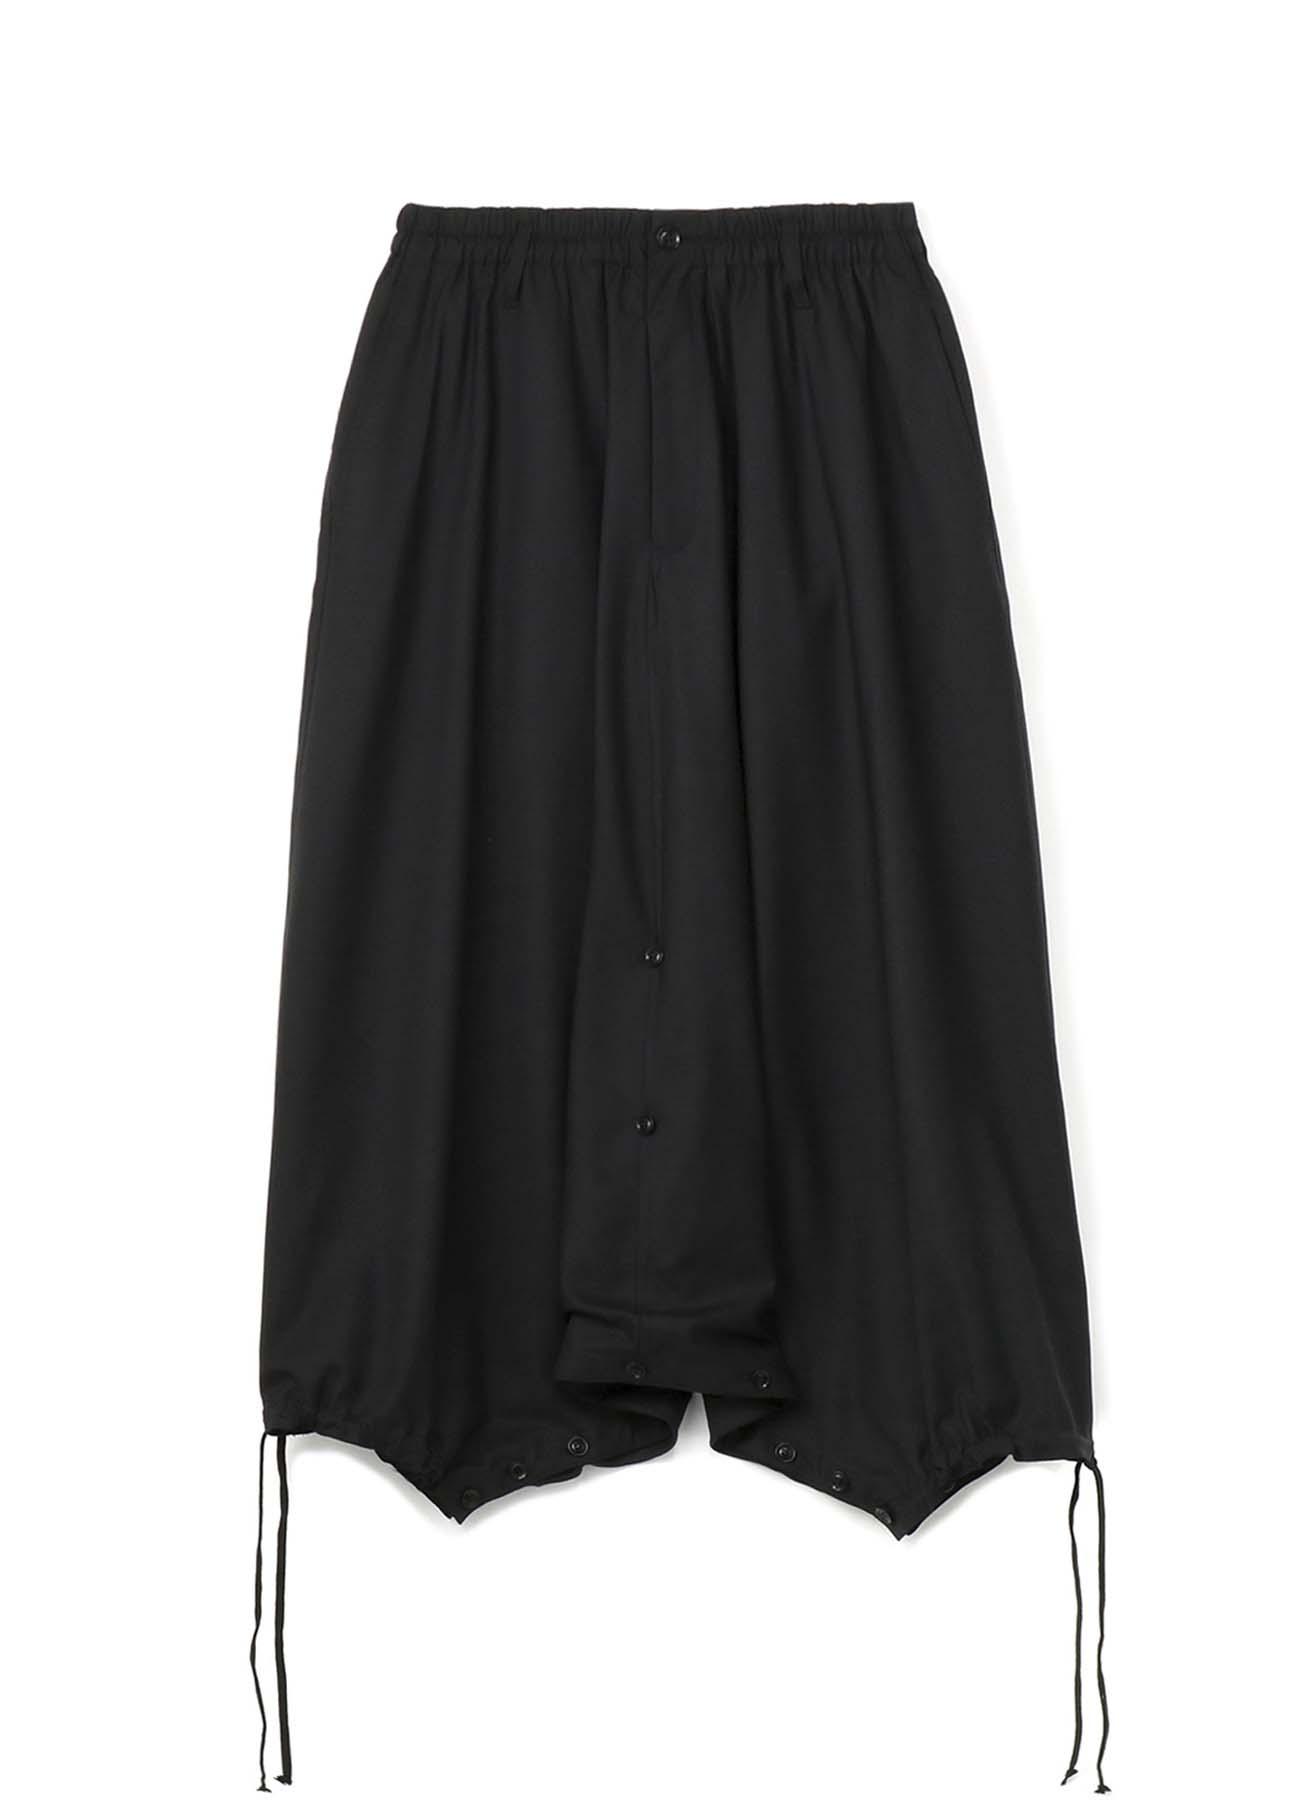 No.12 変形スカートパンツ